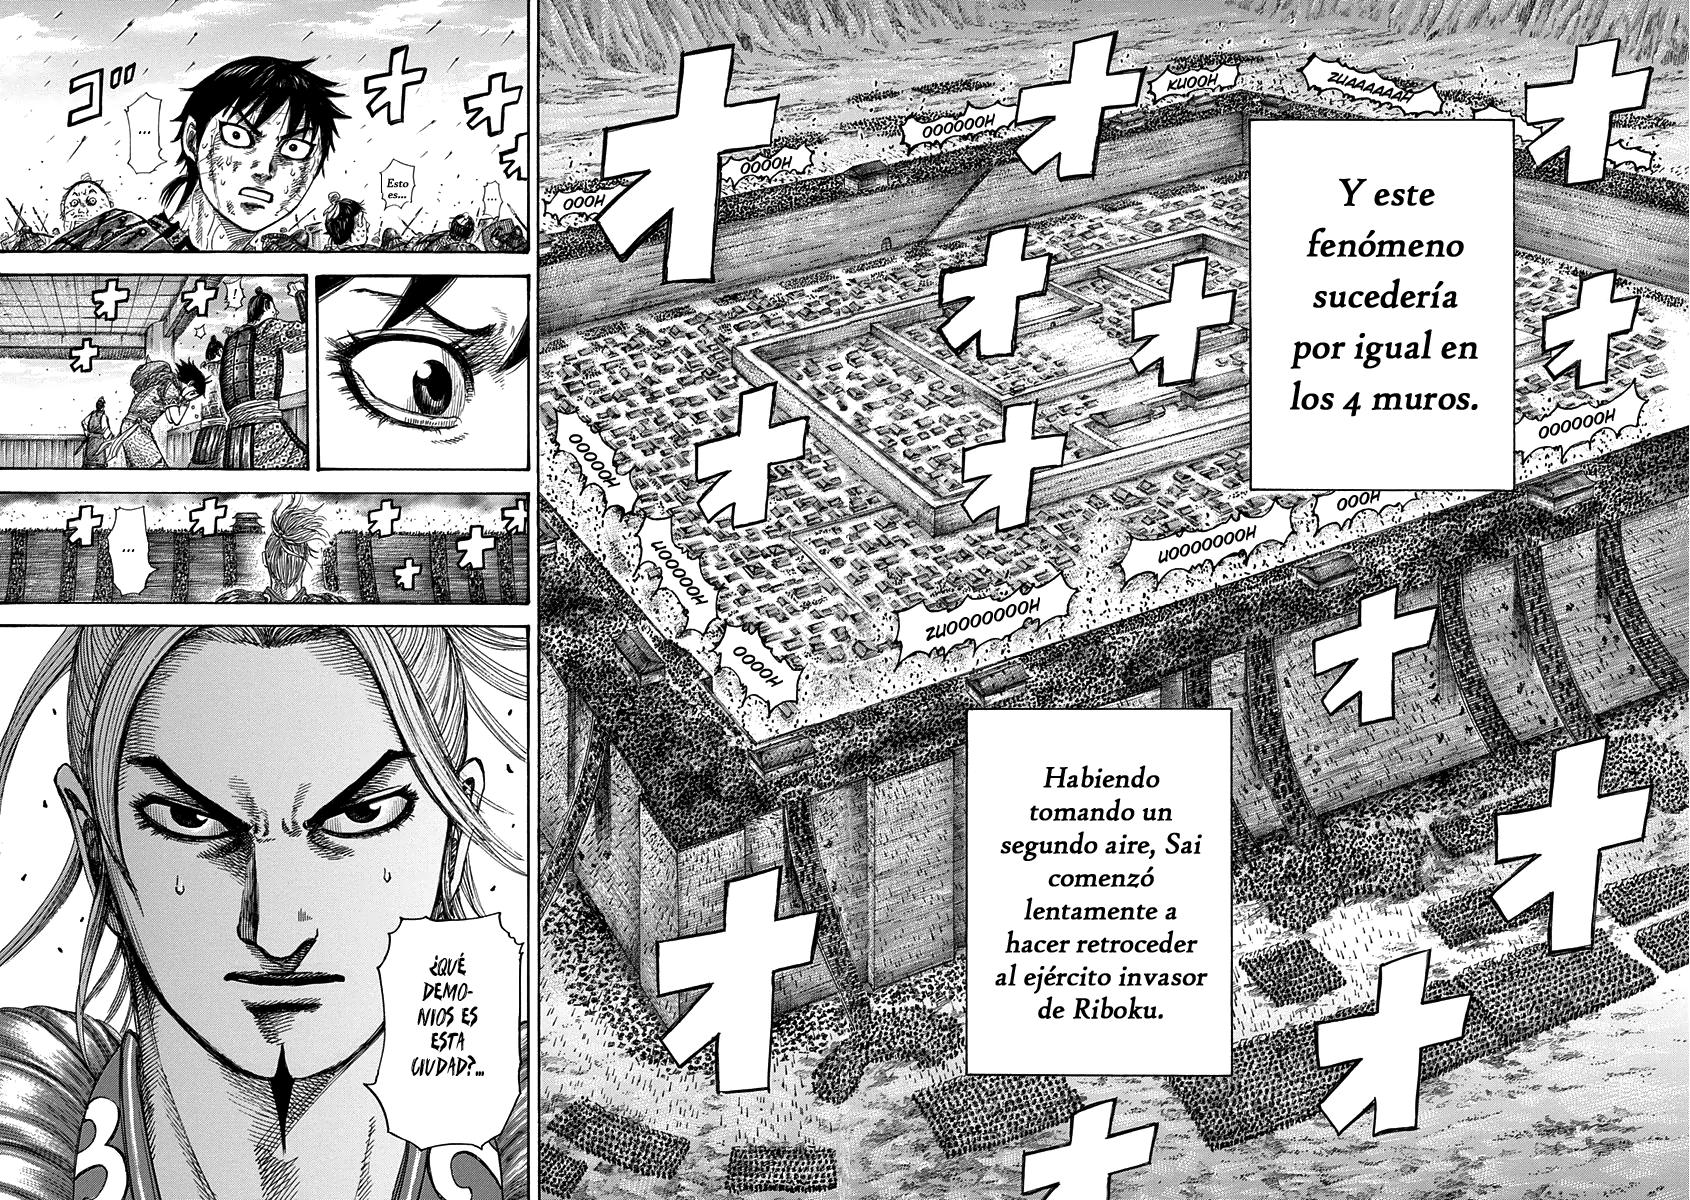 http://c5.ninemanga.com/es_manga/19/12307/360923/d8166895388be59b84a430ce0697df62.jpg Page 9